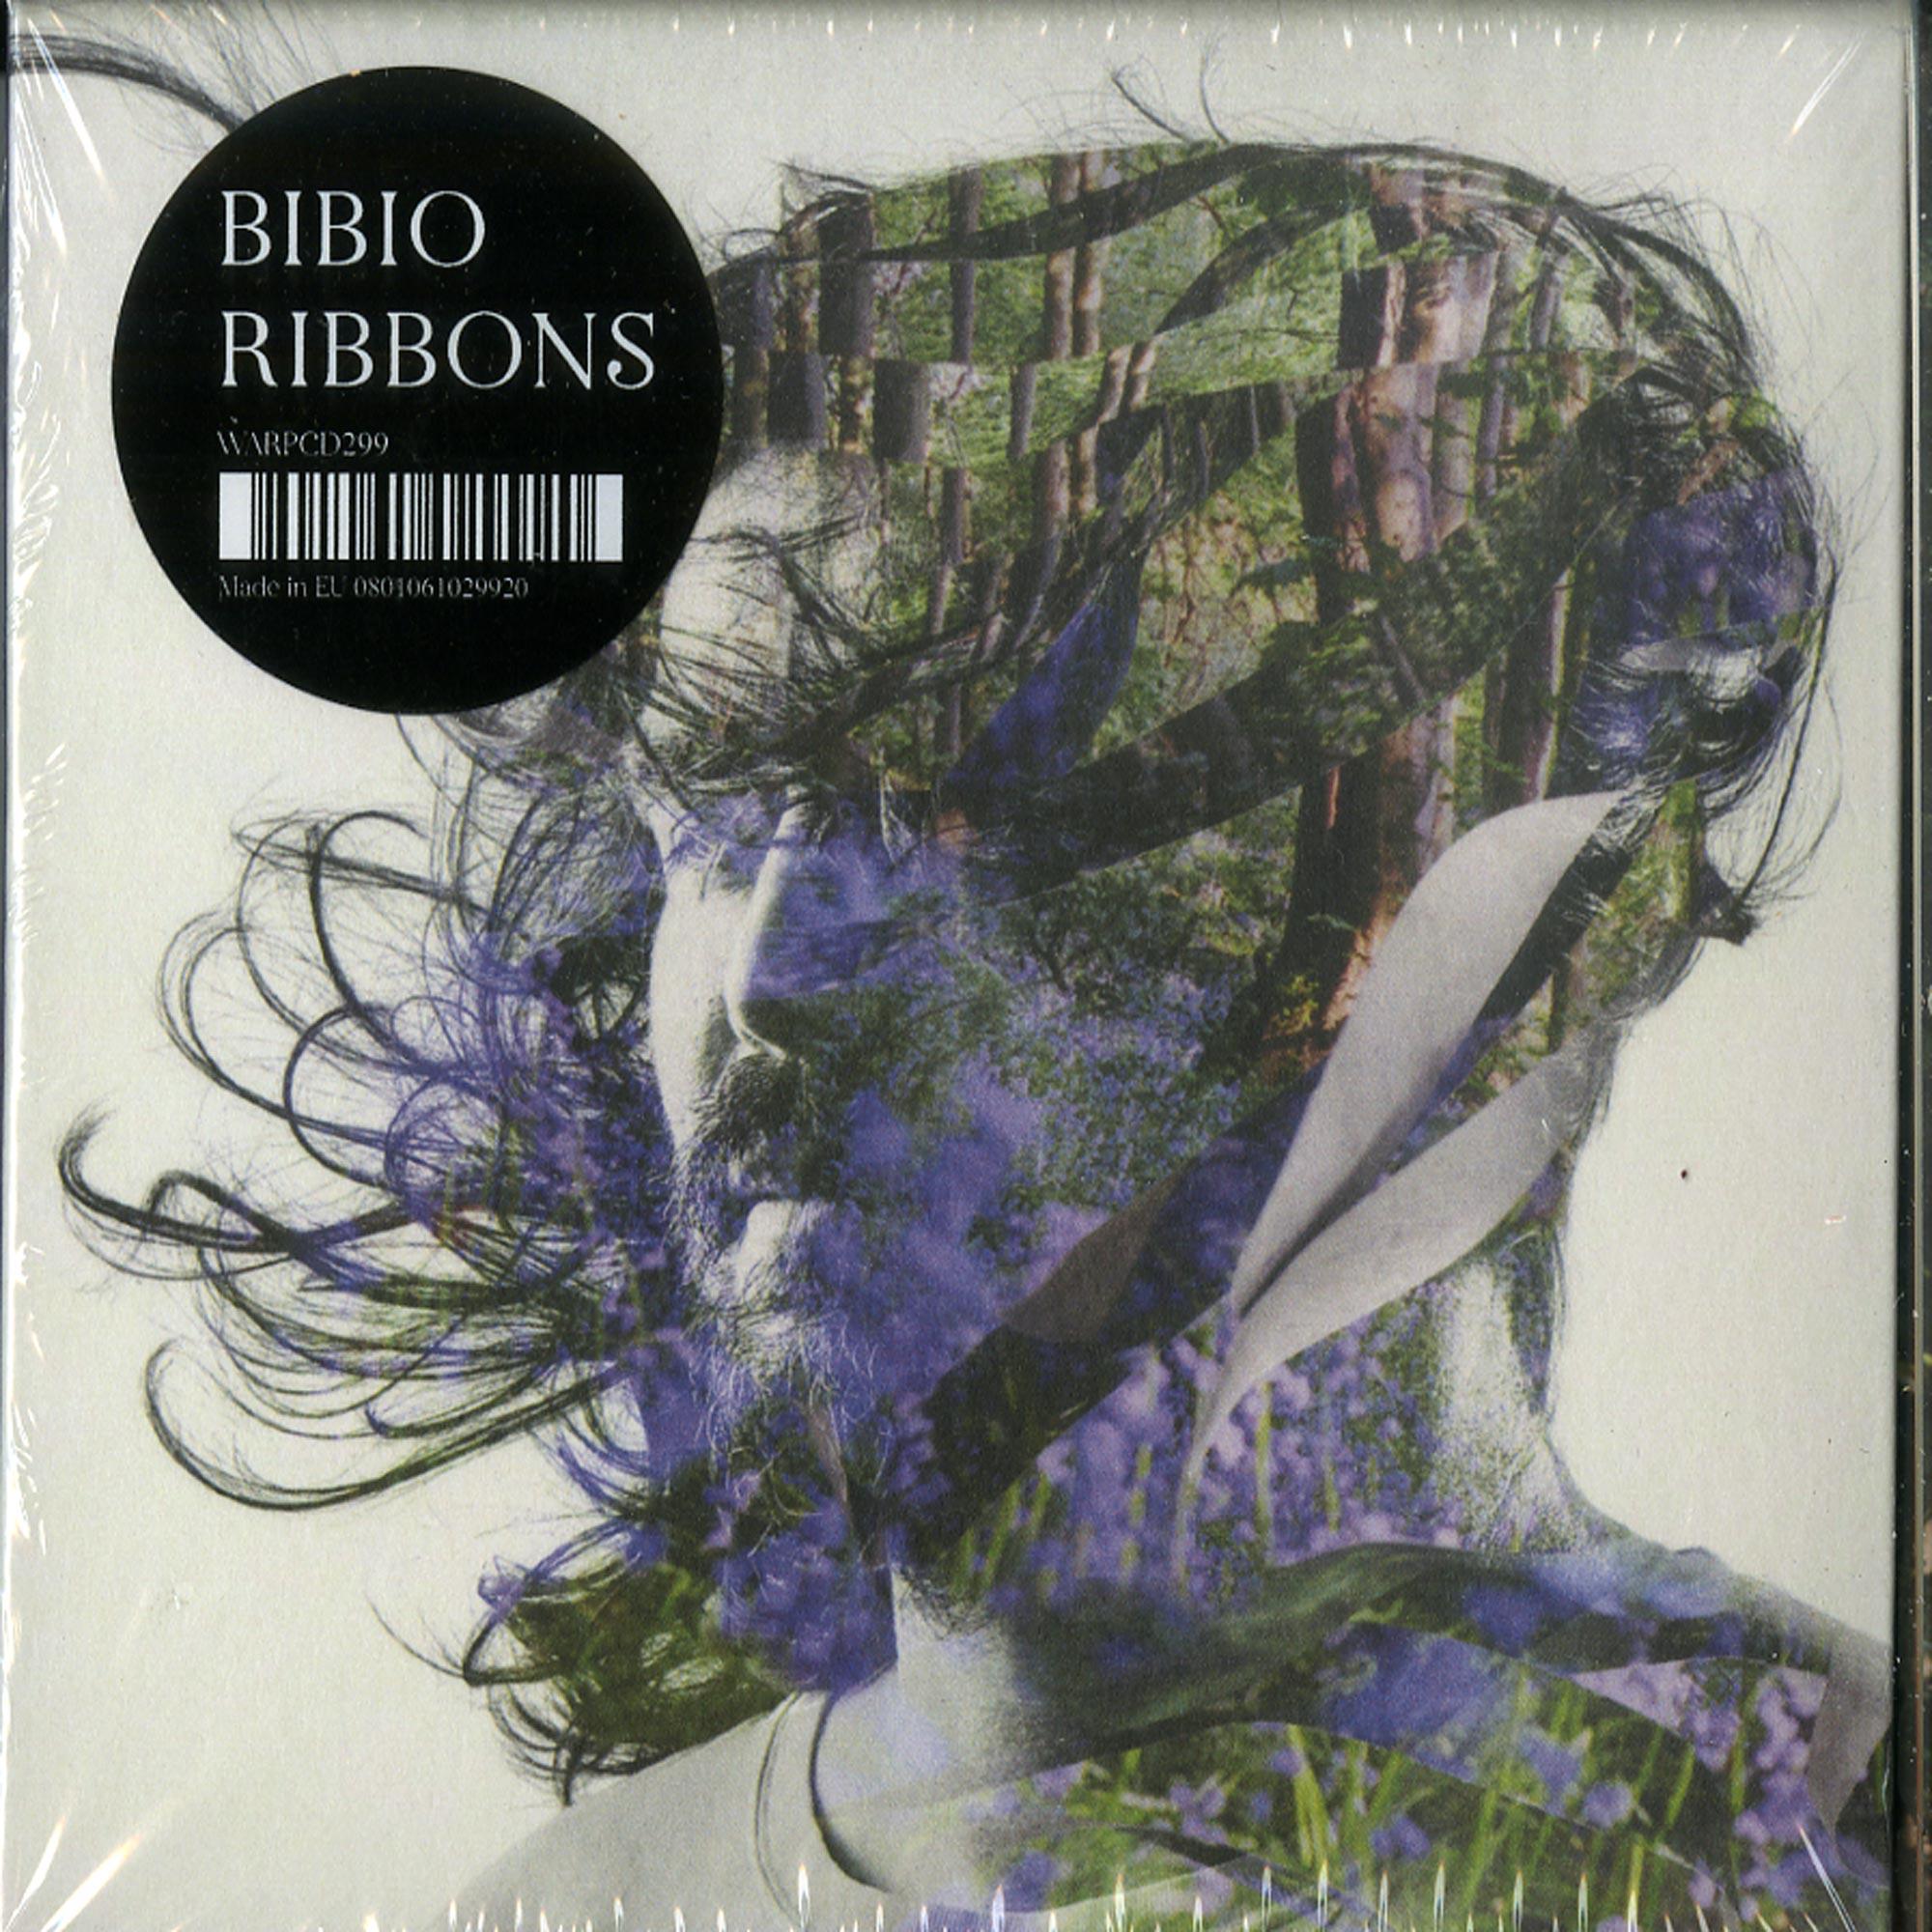 Bibio - RIBBONS